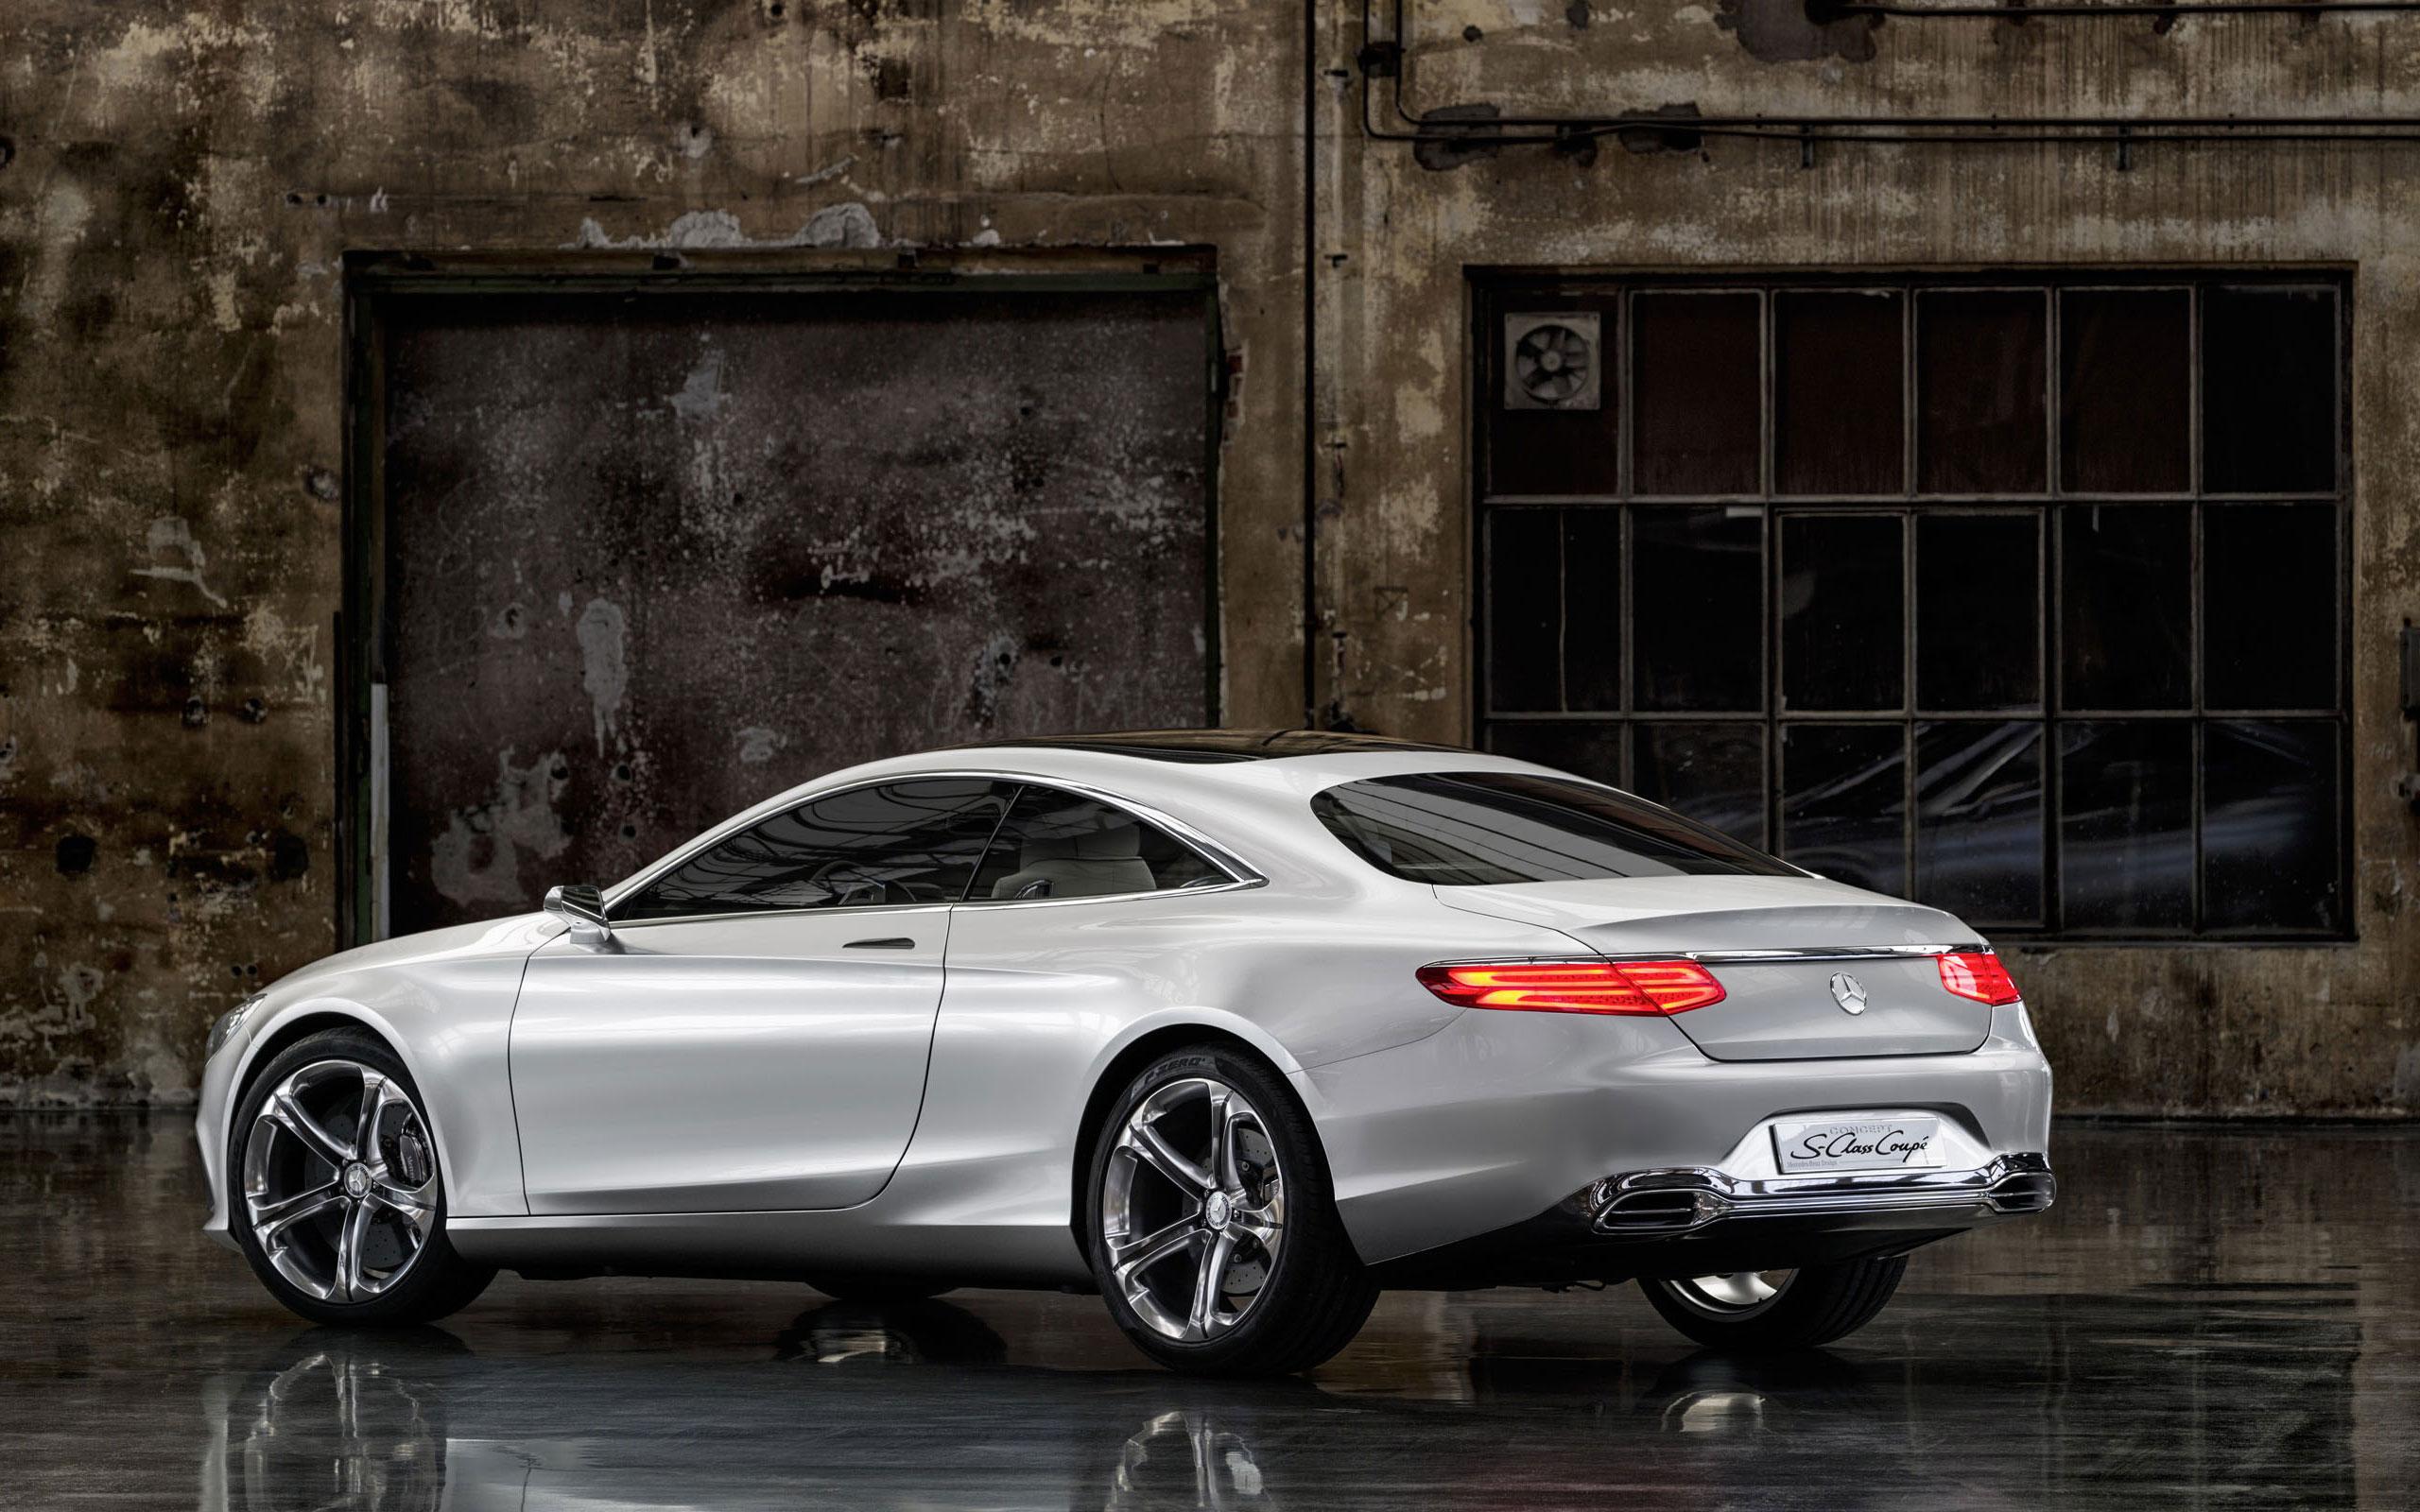 S Class Coupe >> Concept S Class Coupe Future Vehicle Mercedes Benz